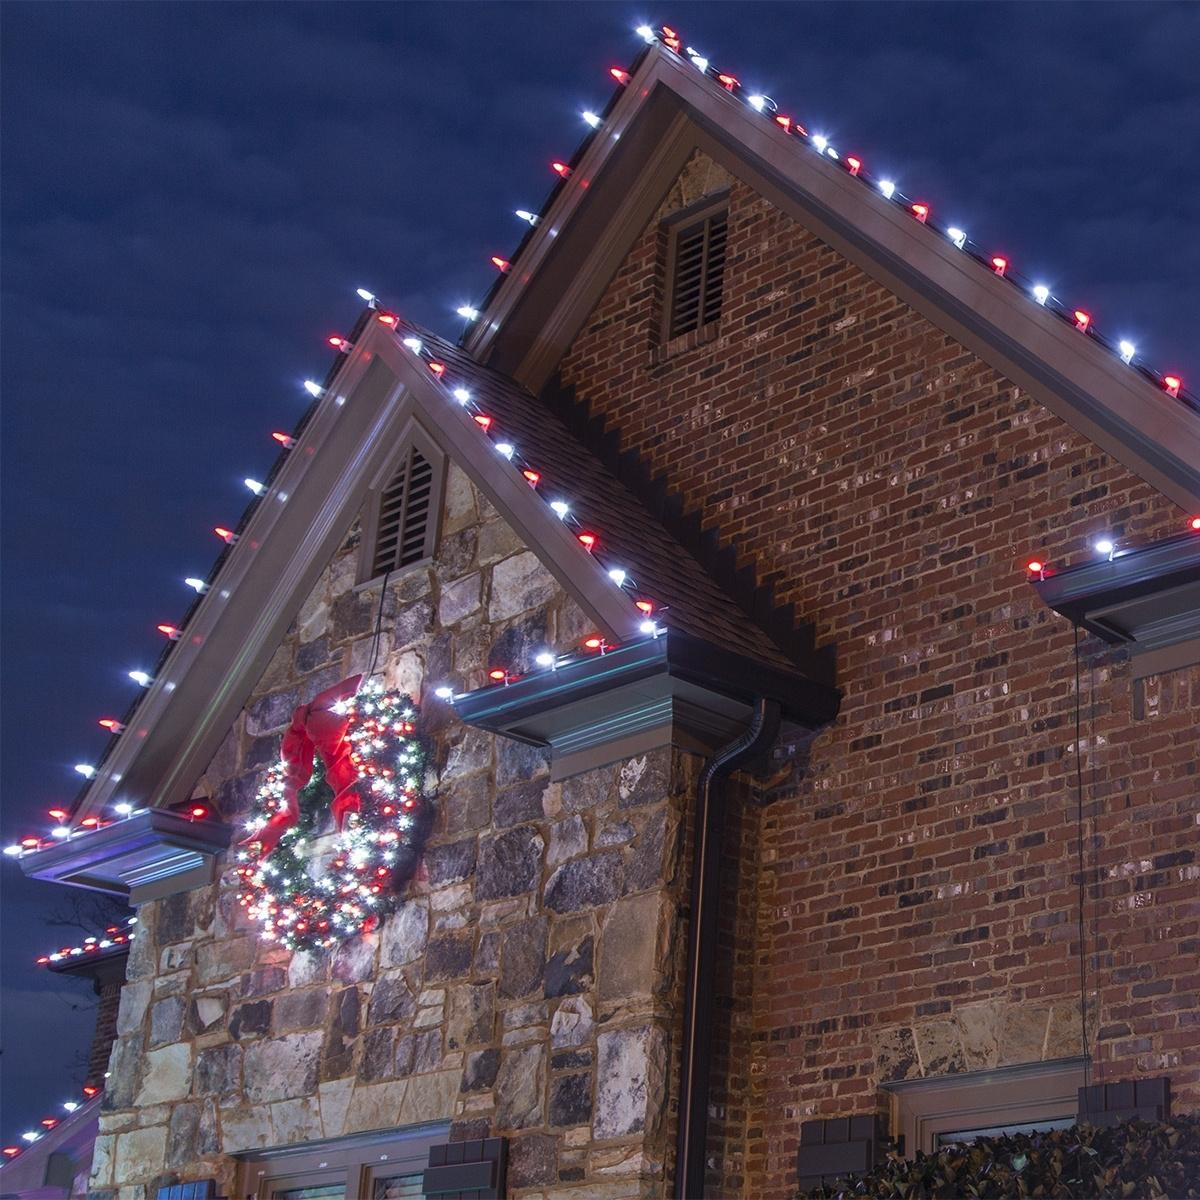 Christmas Lights For Outdoor Hanging Lights For Christmas (#2 of 15)